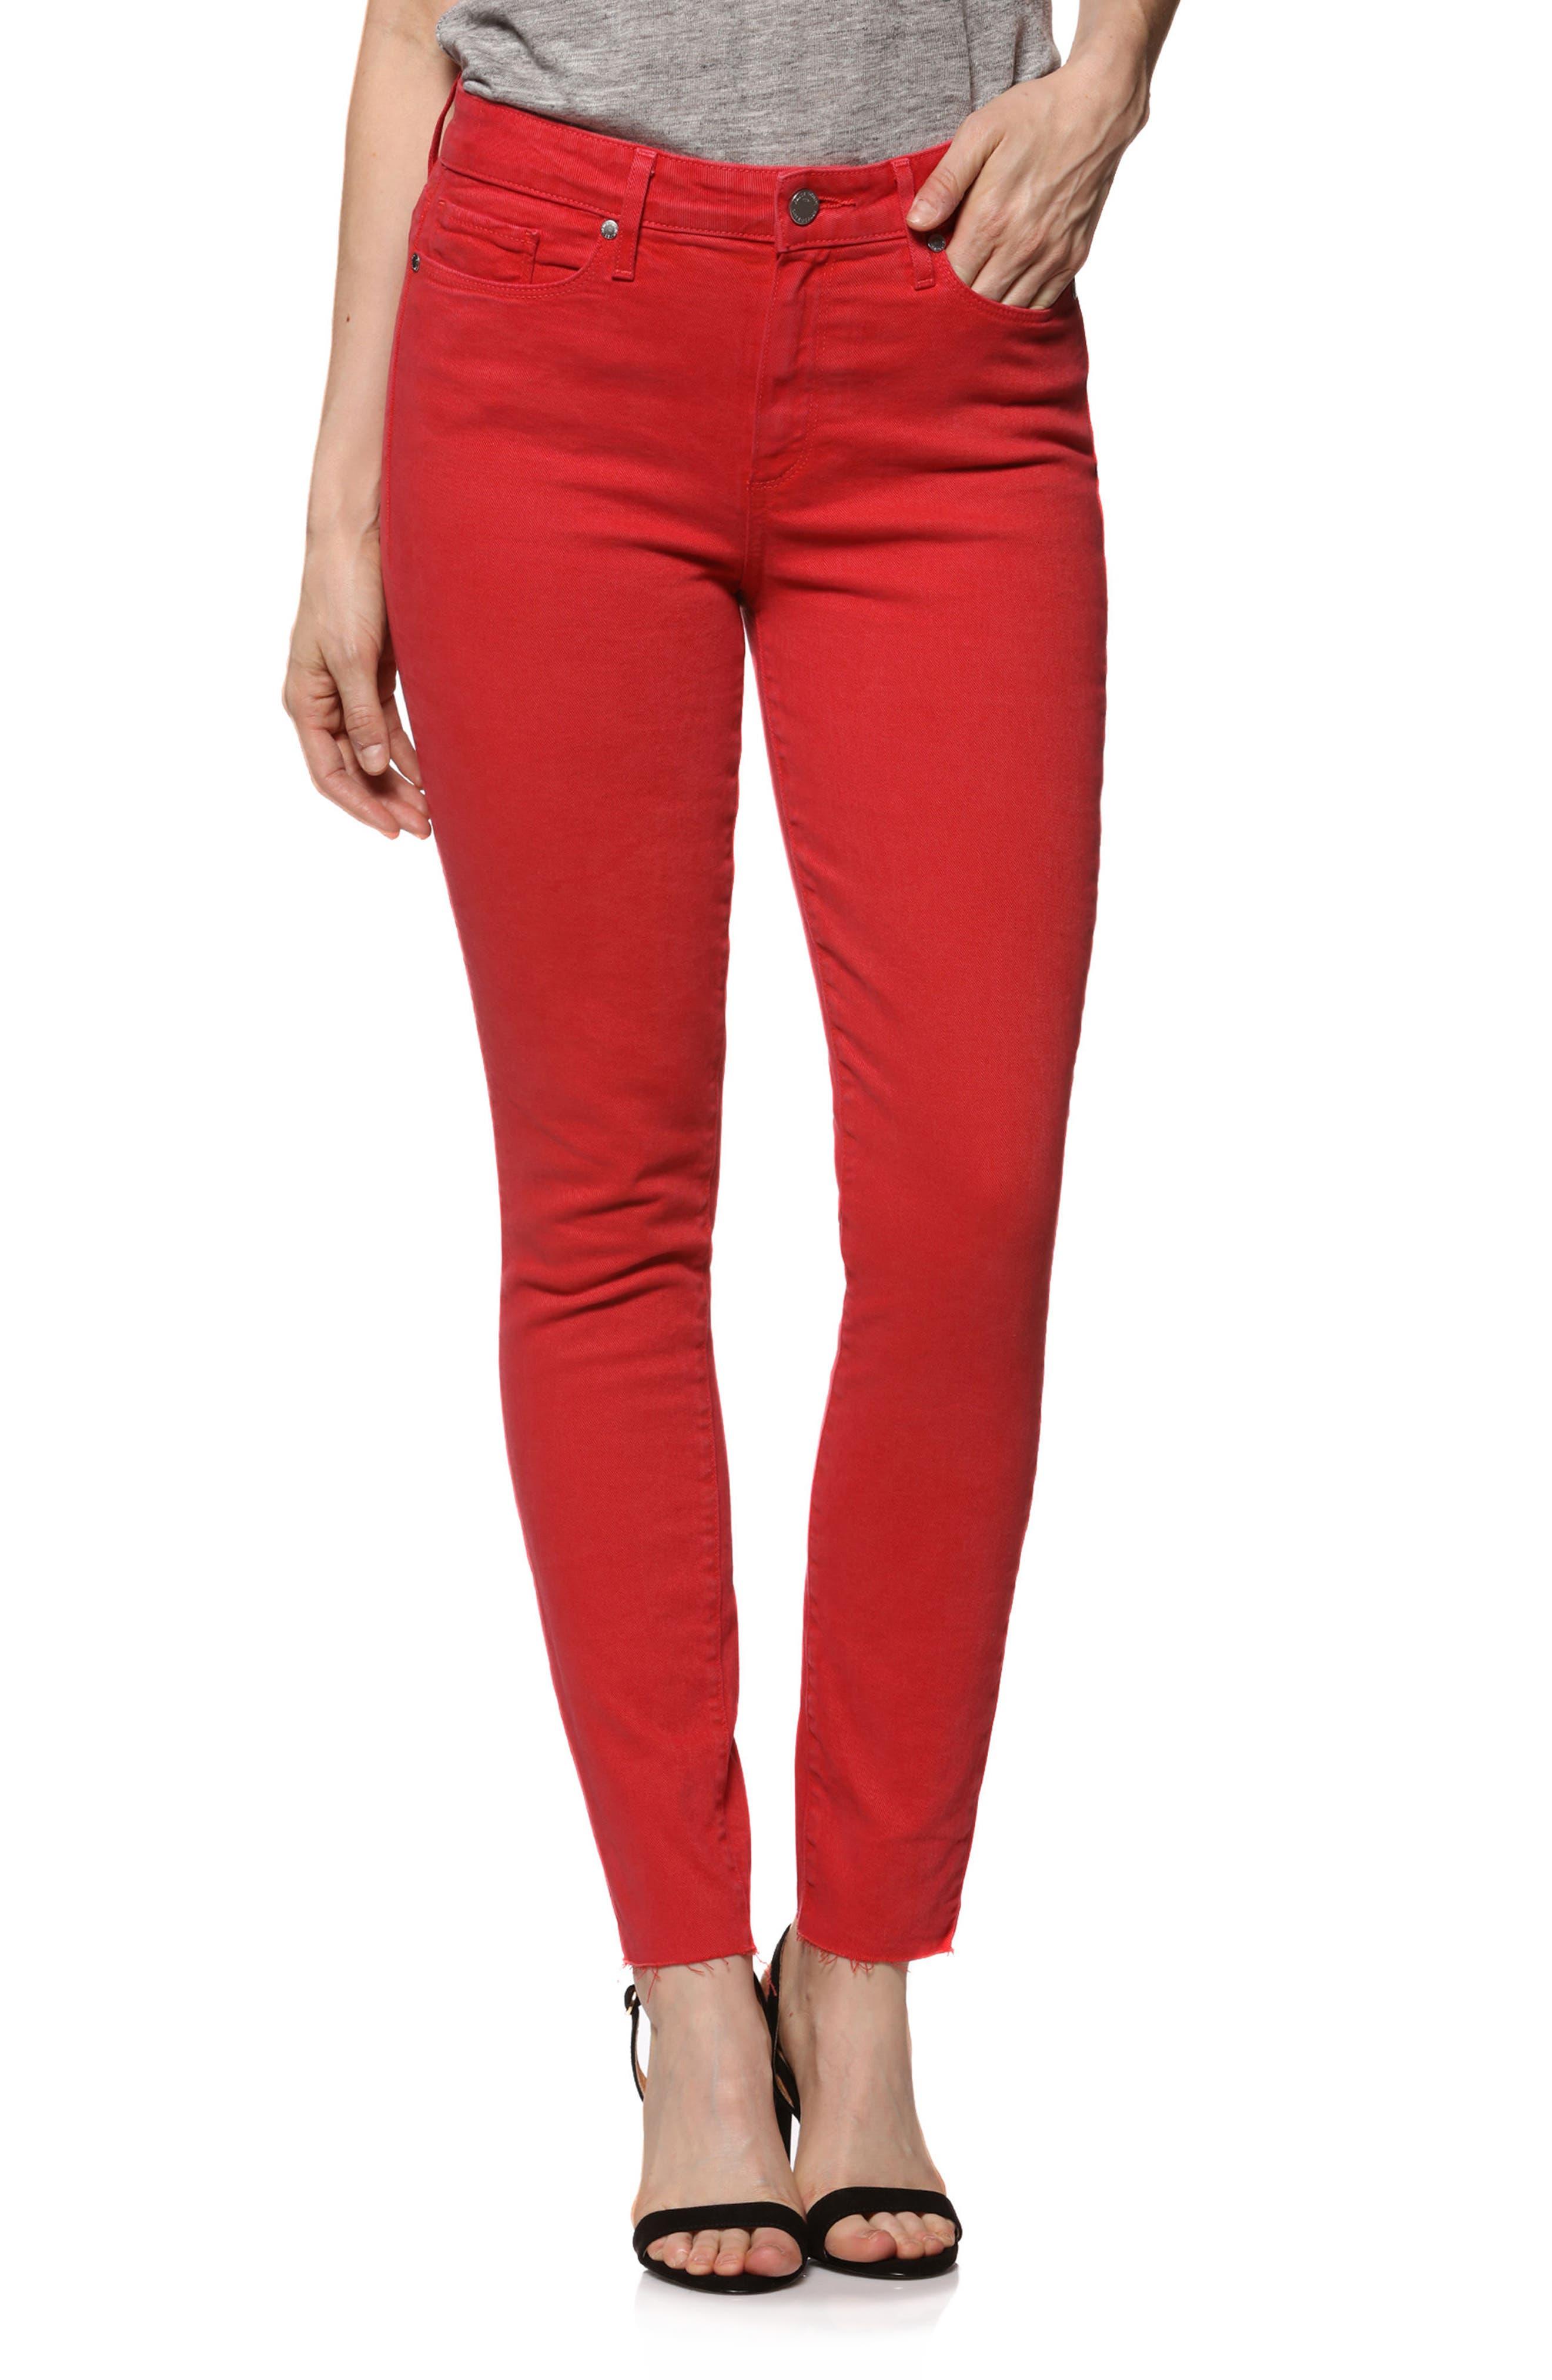 Hoxton High Waist Ankle Skinny Jeans,                             Main thumbnail 1, color,                             649